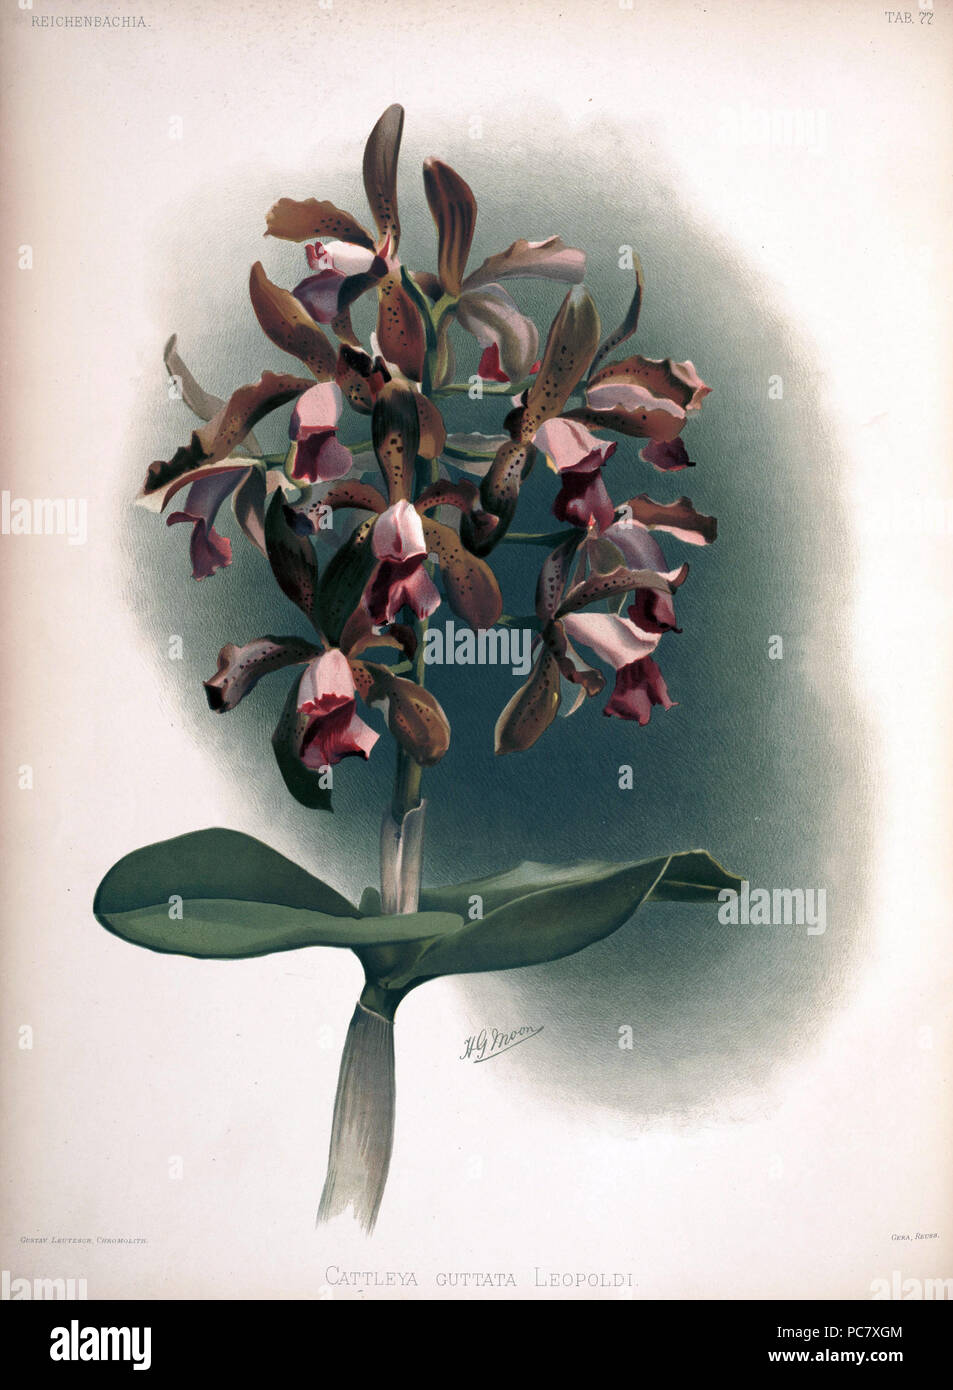 220 Frederick Sander - Reichenbachia II plate 77 (1890) - Cattleya guttata leopoldi - Stock Image